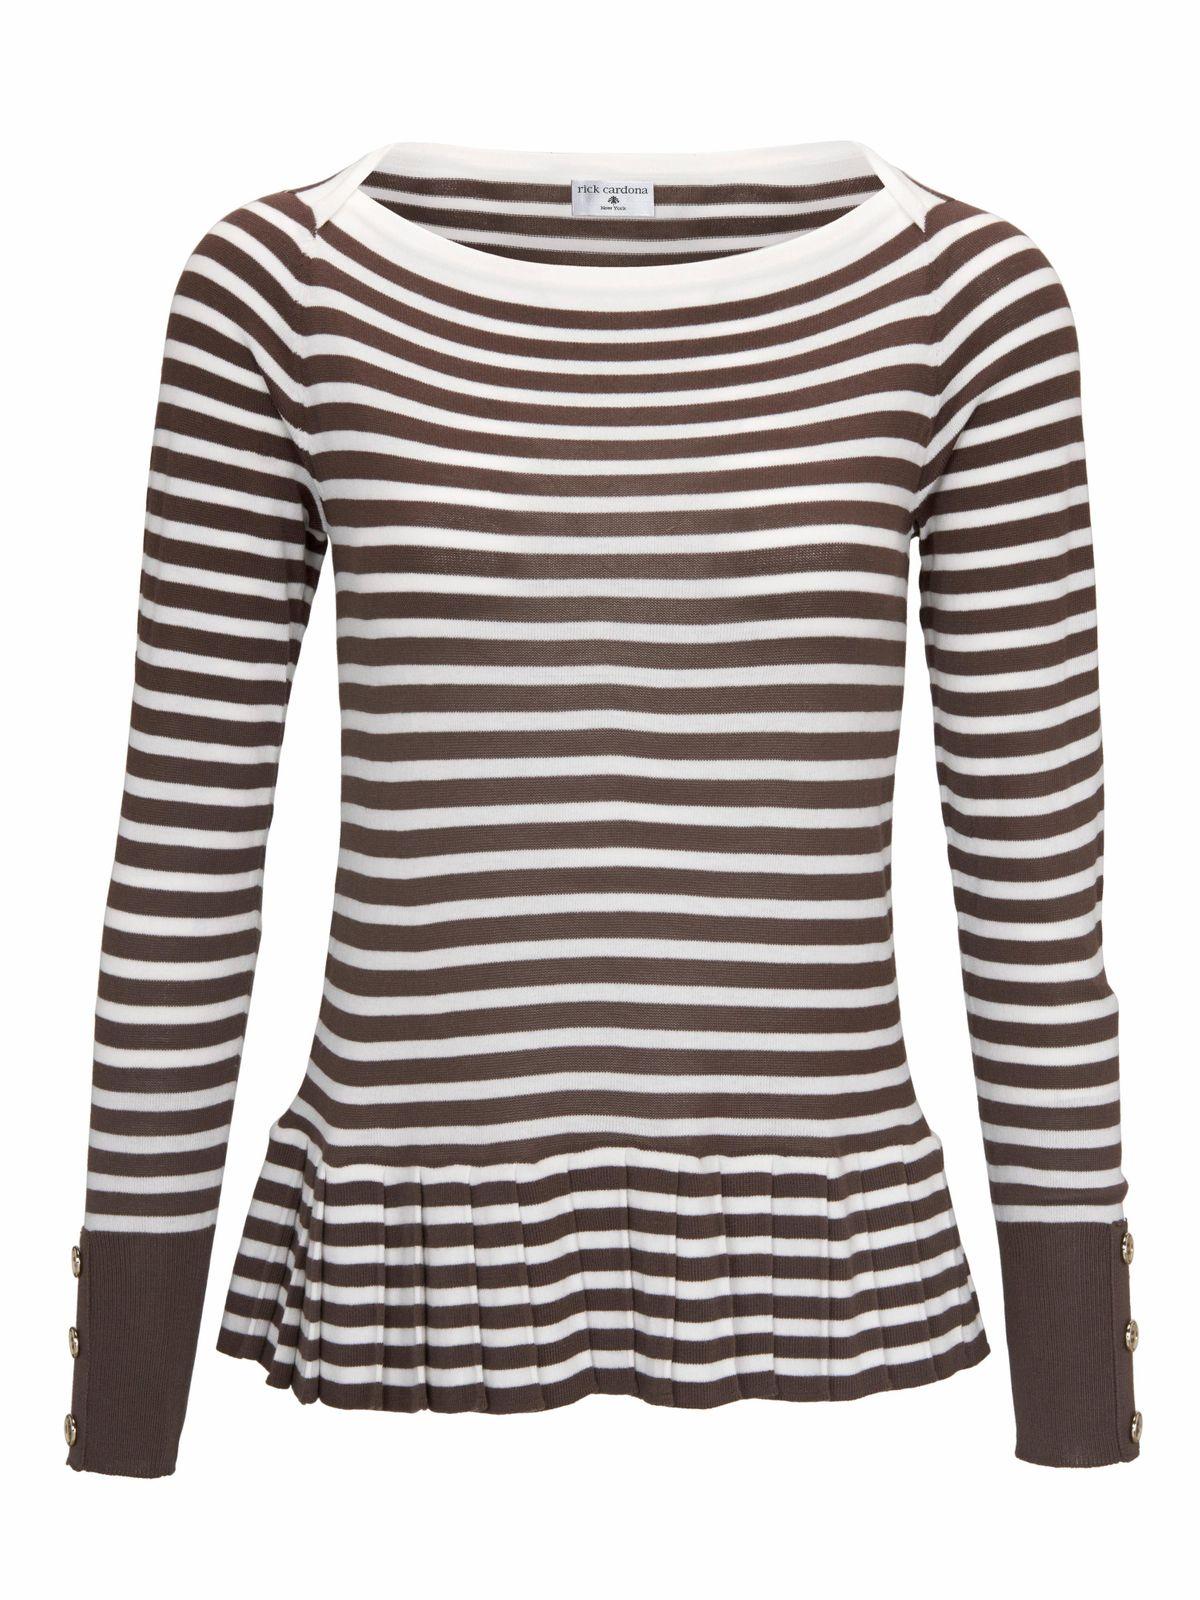 rick cardona auffällige Bluse Damen Druckbluse Shirt Große Größe Bunt Fashion